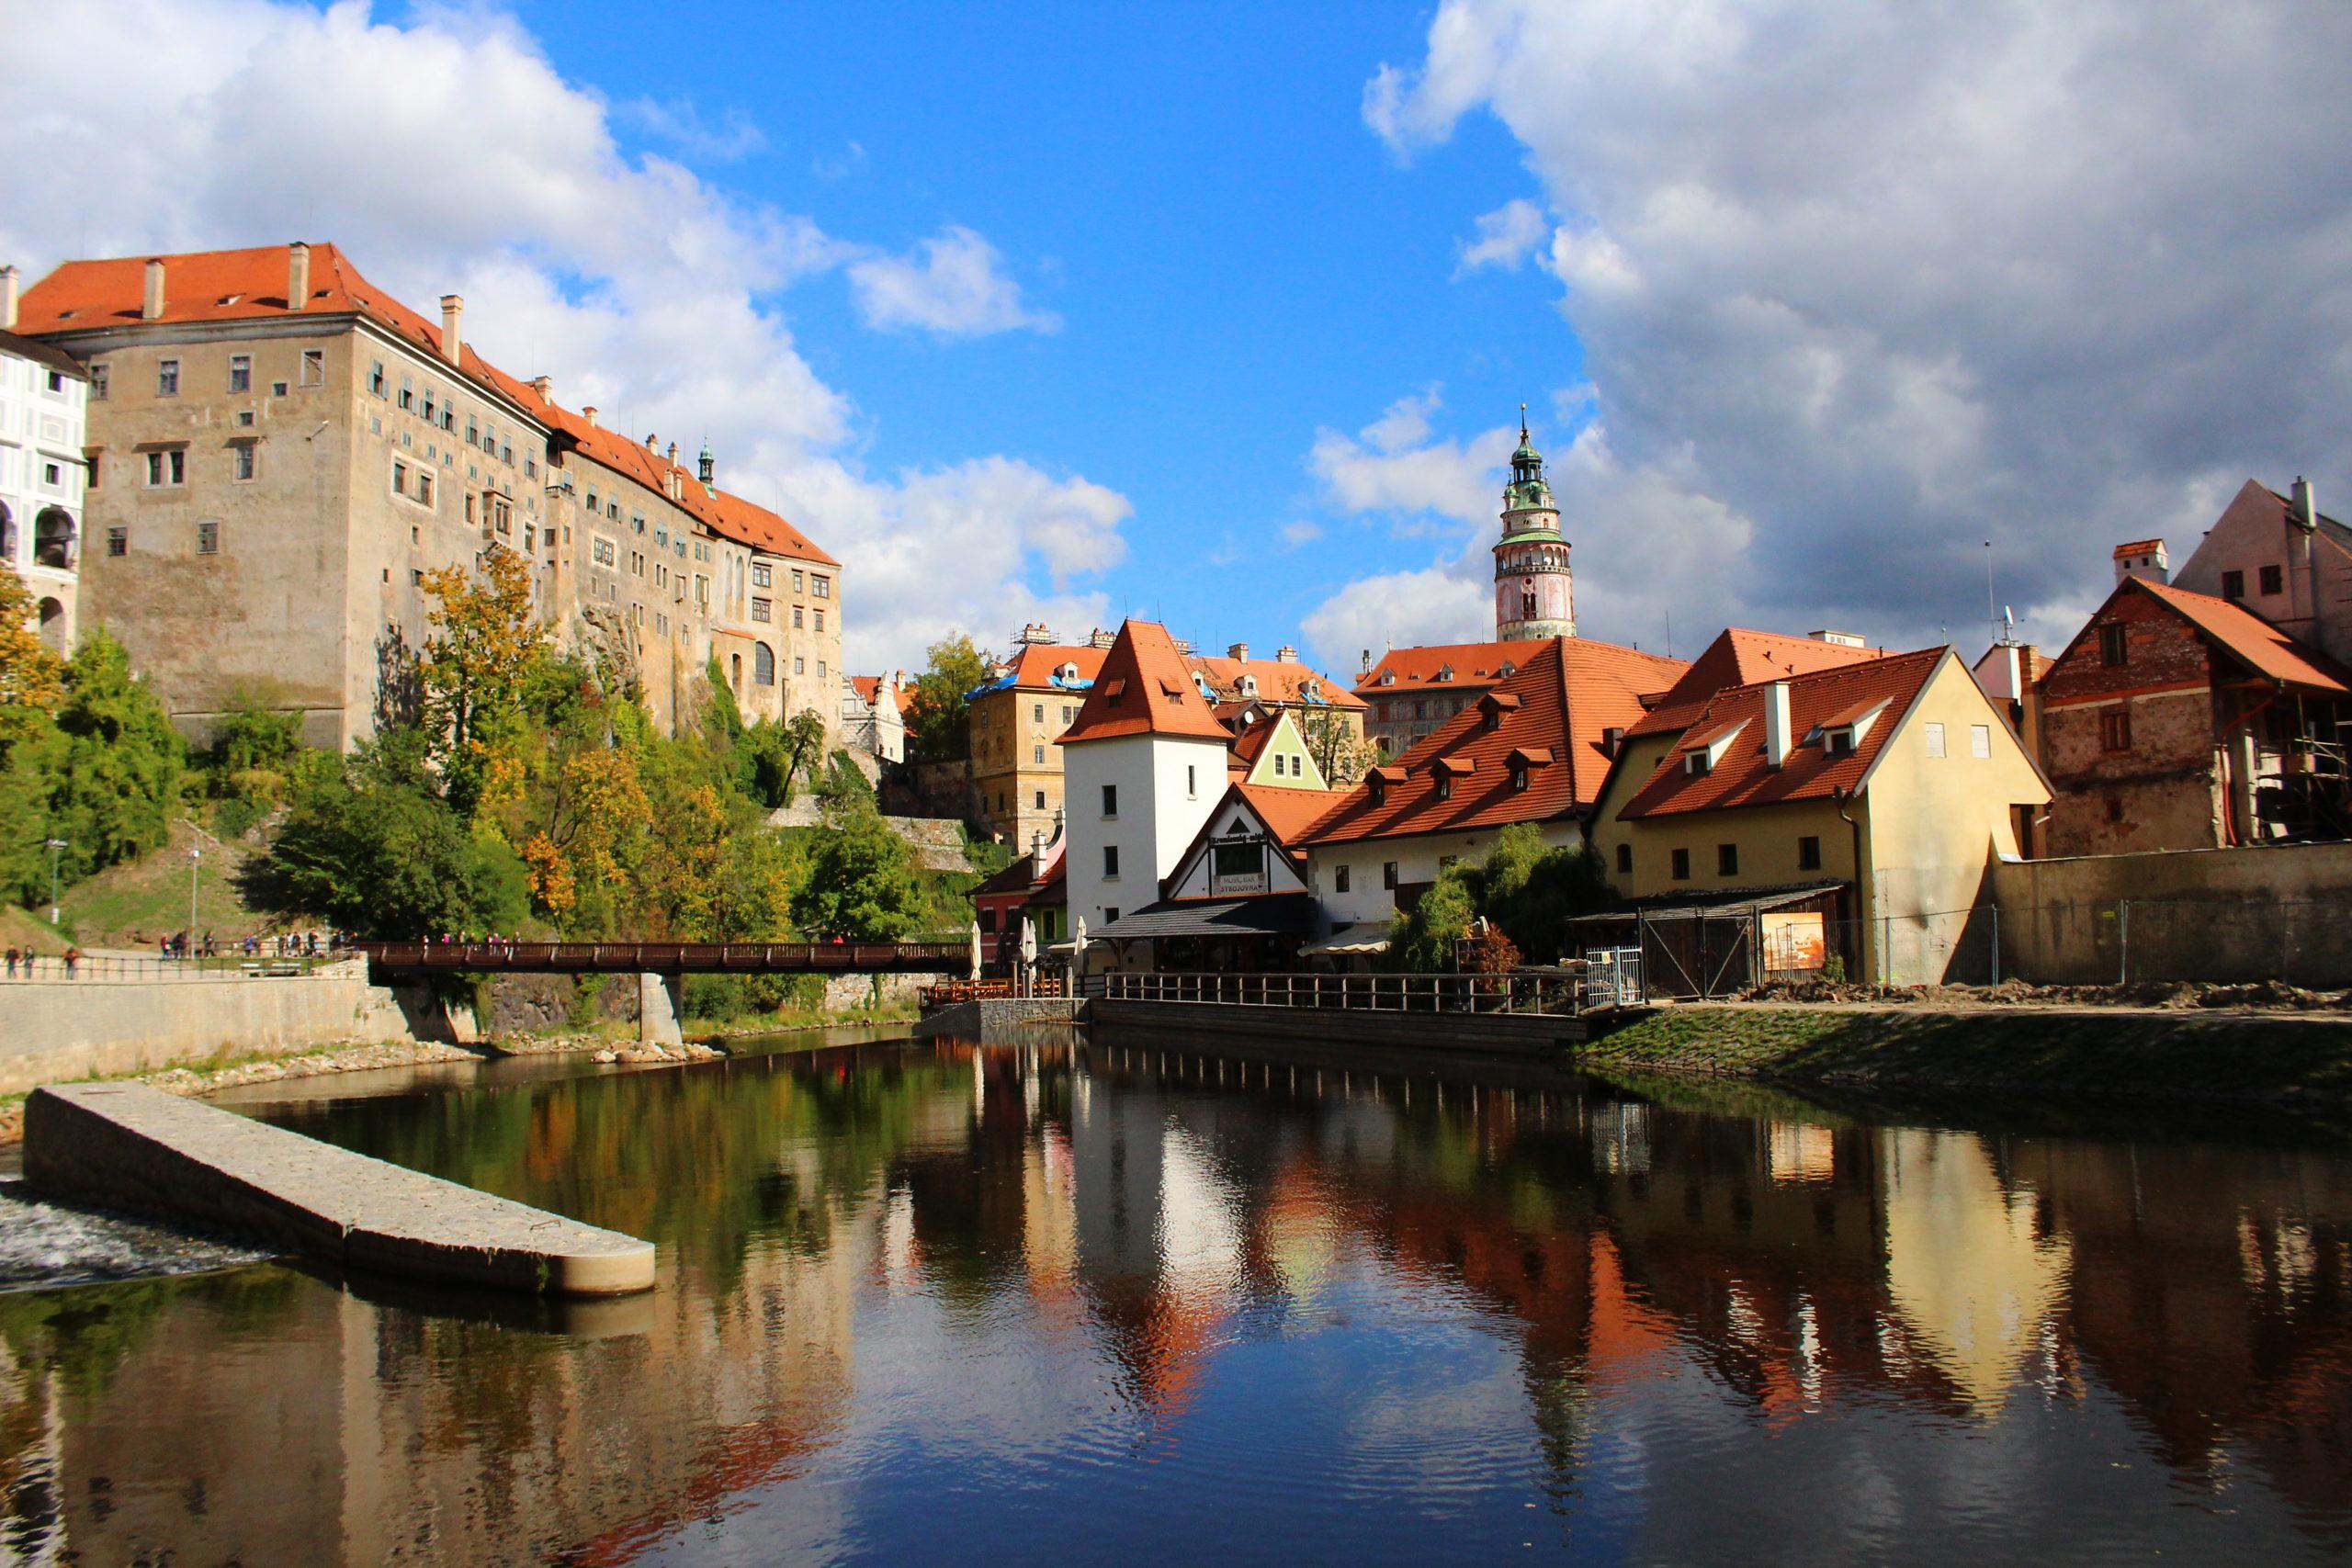 The Vltava River | Things to do in Cesky Krumlov